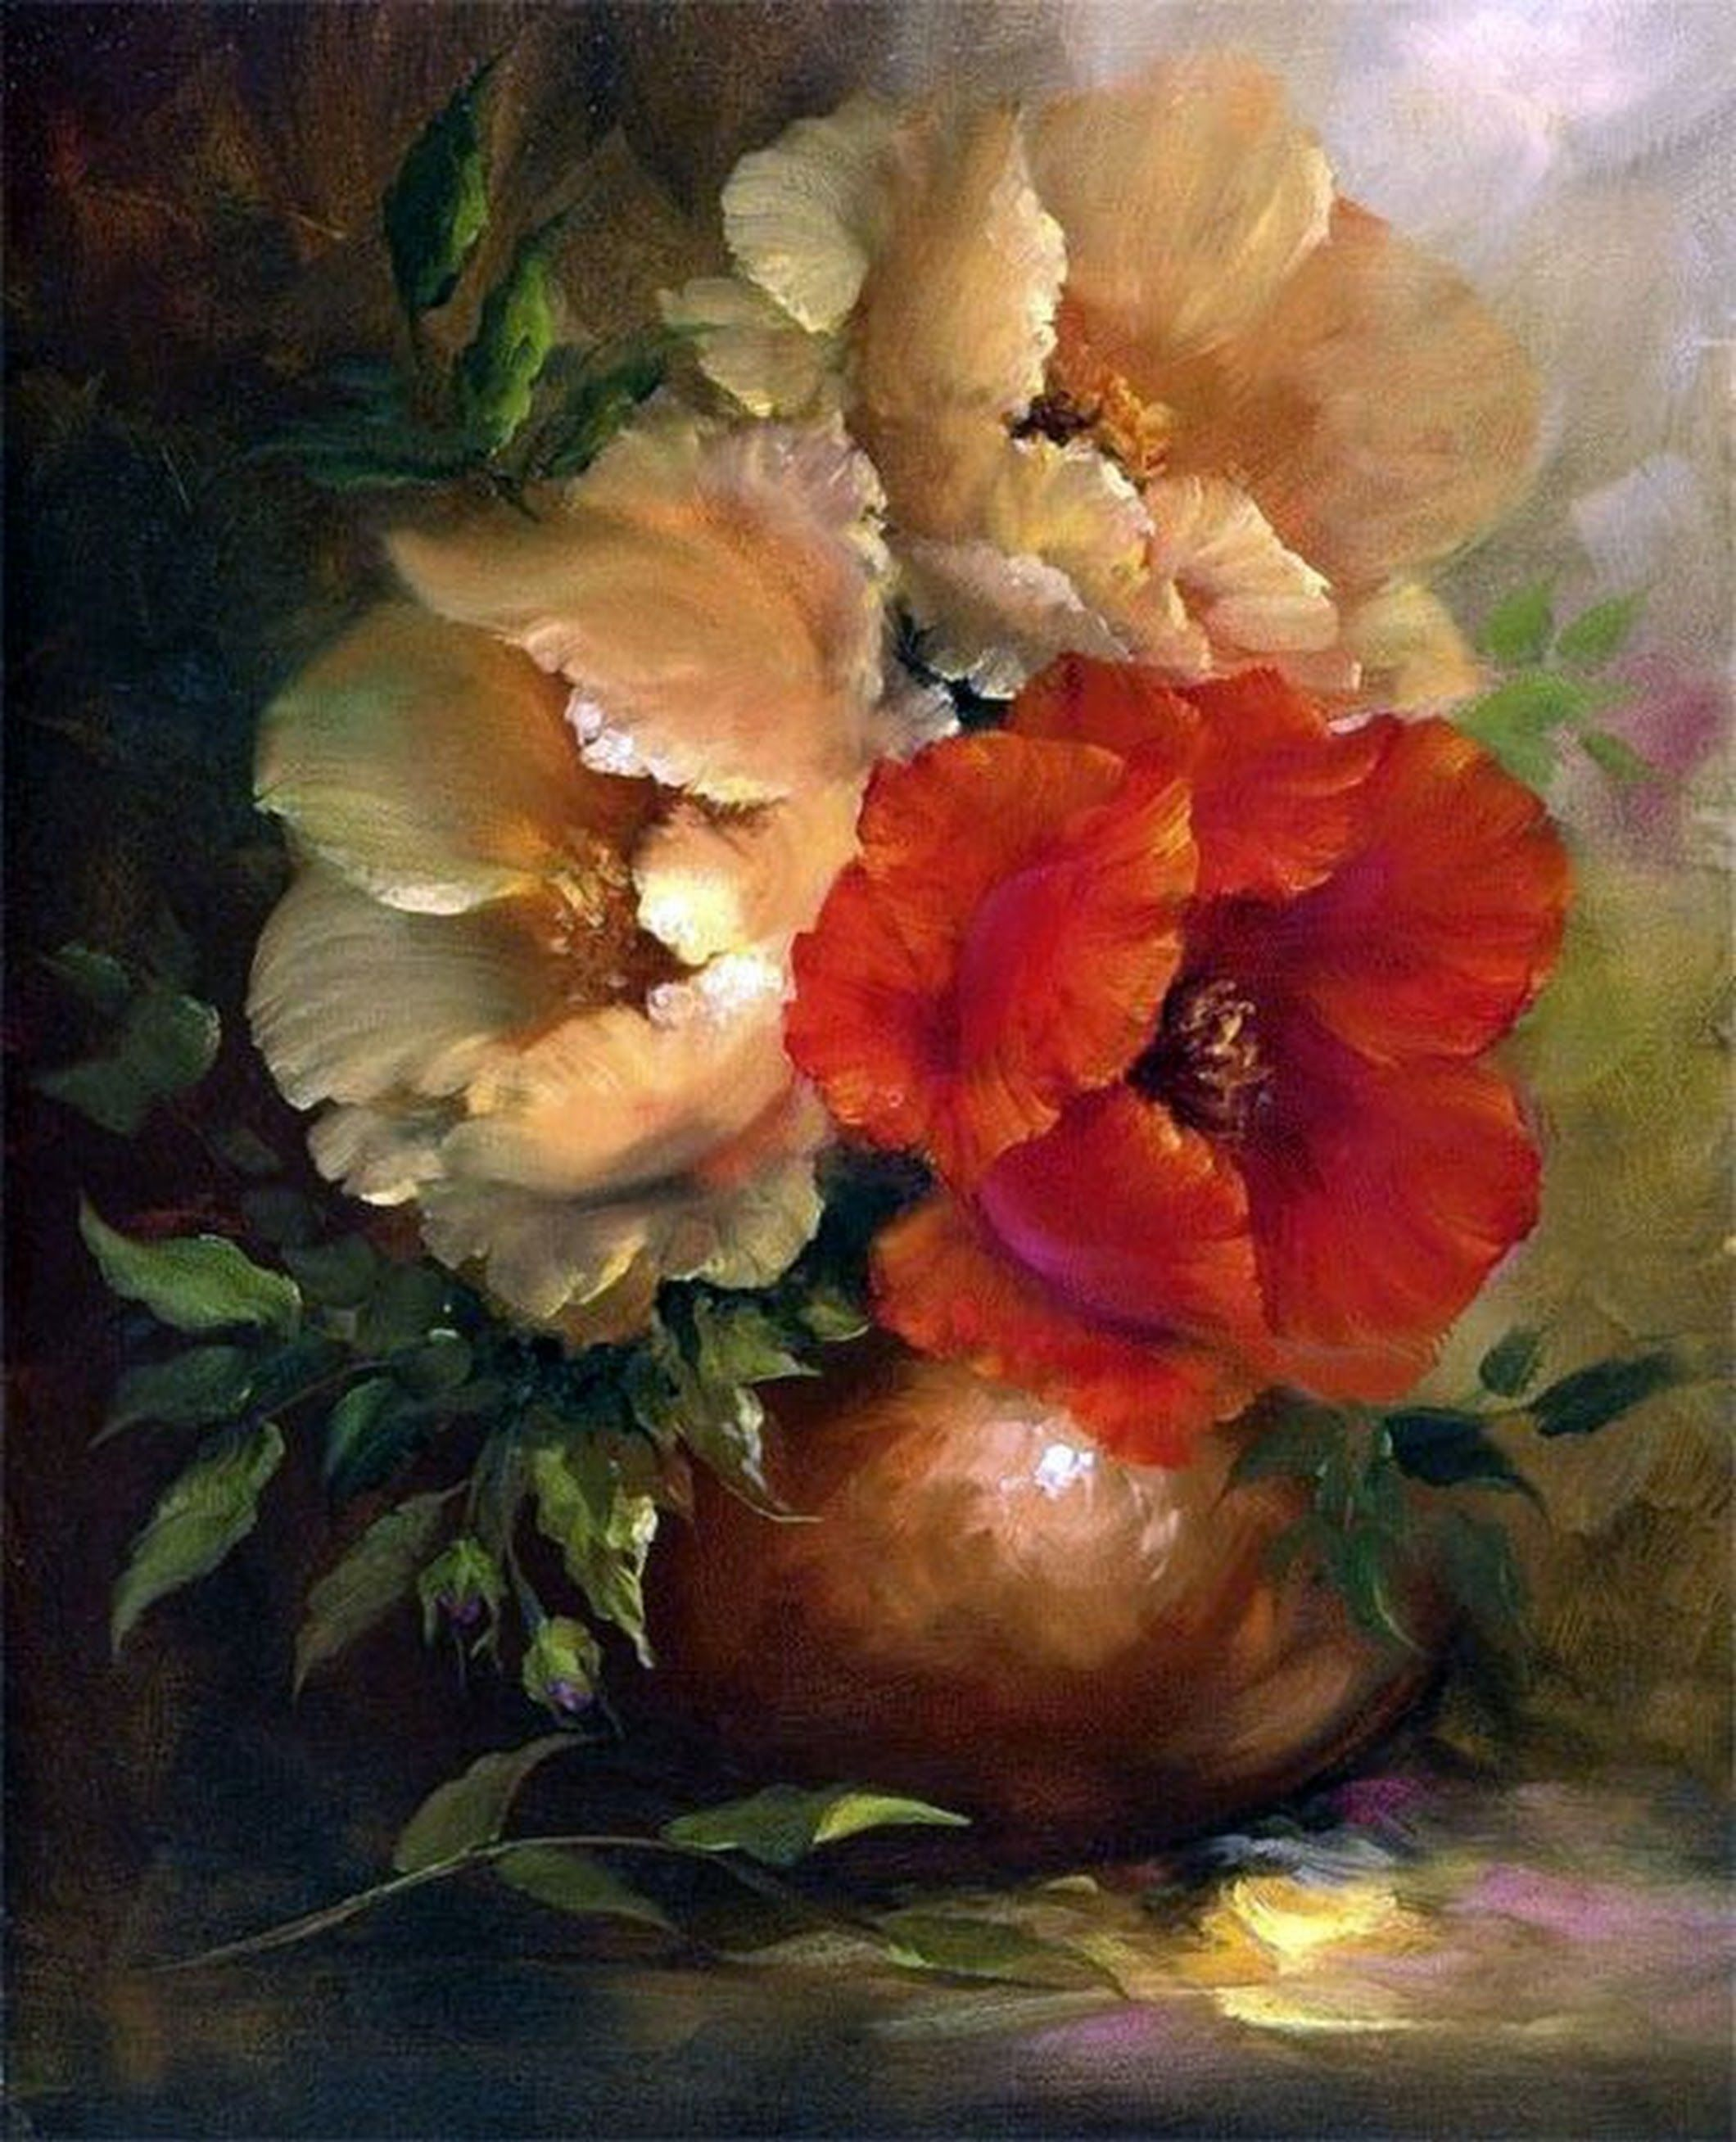 Hel Ar Peinture Fleurs Art Floral Dessin Fruits